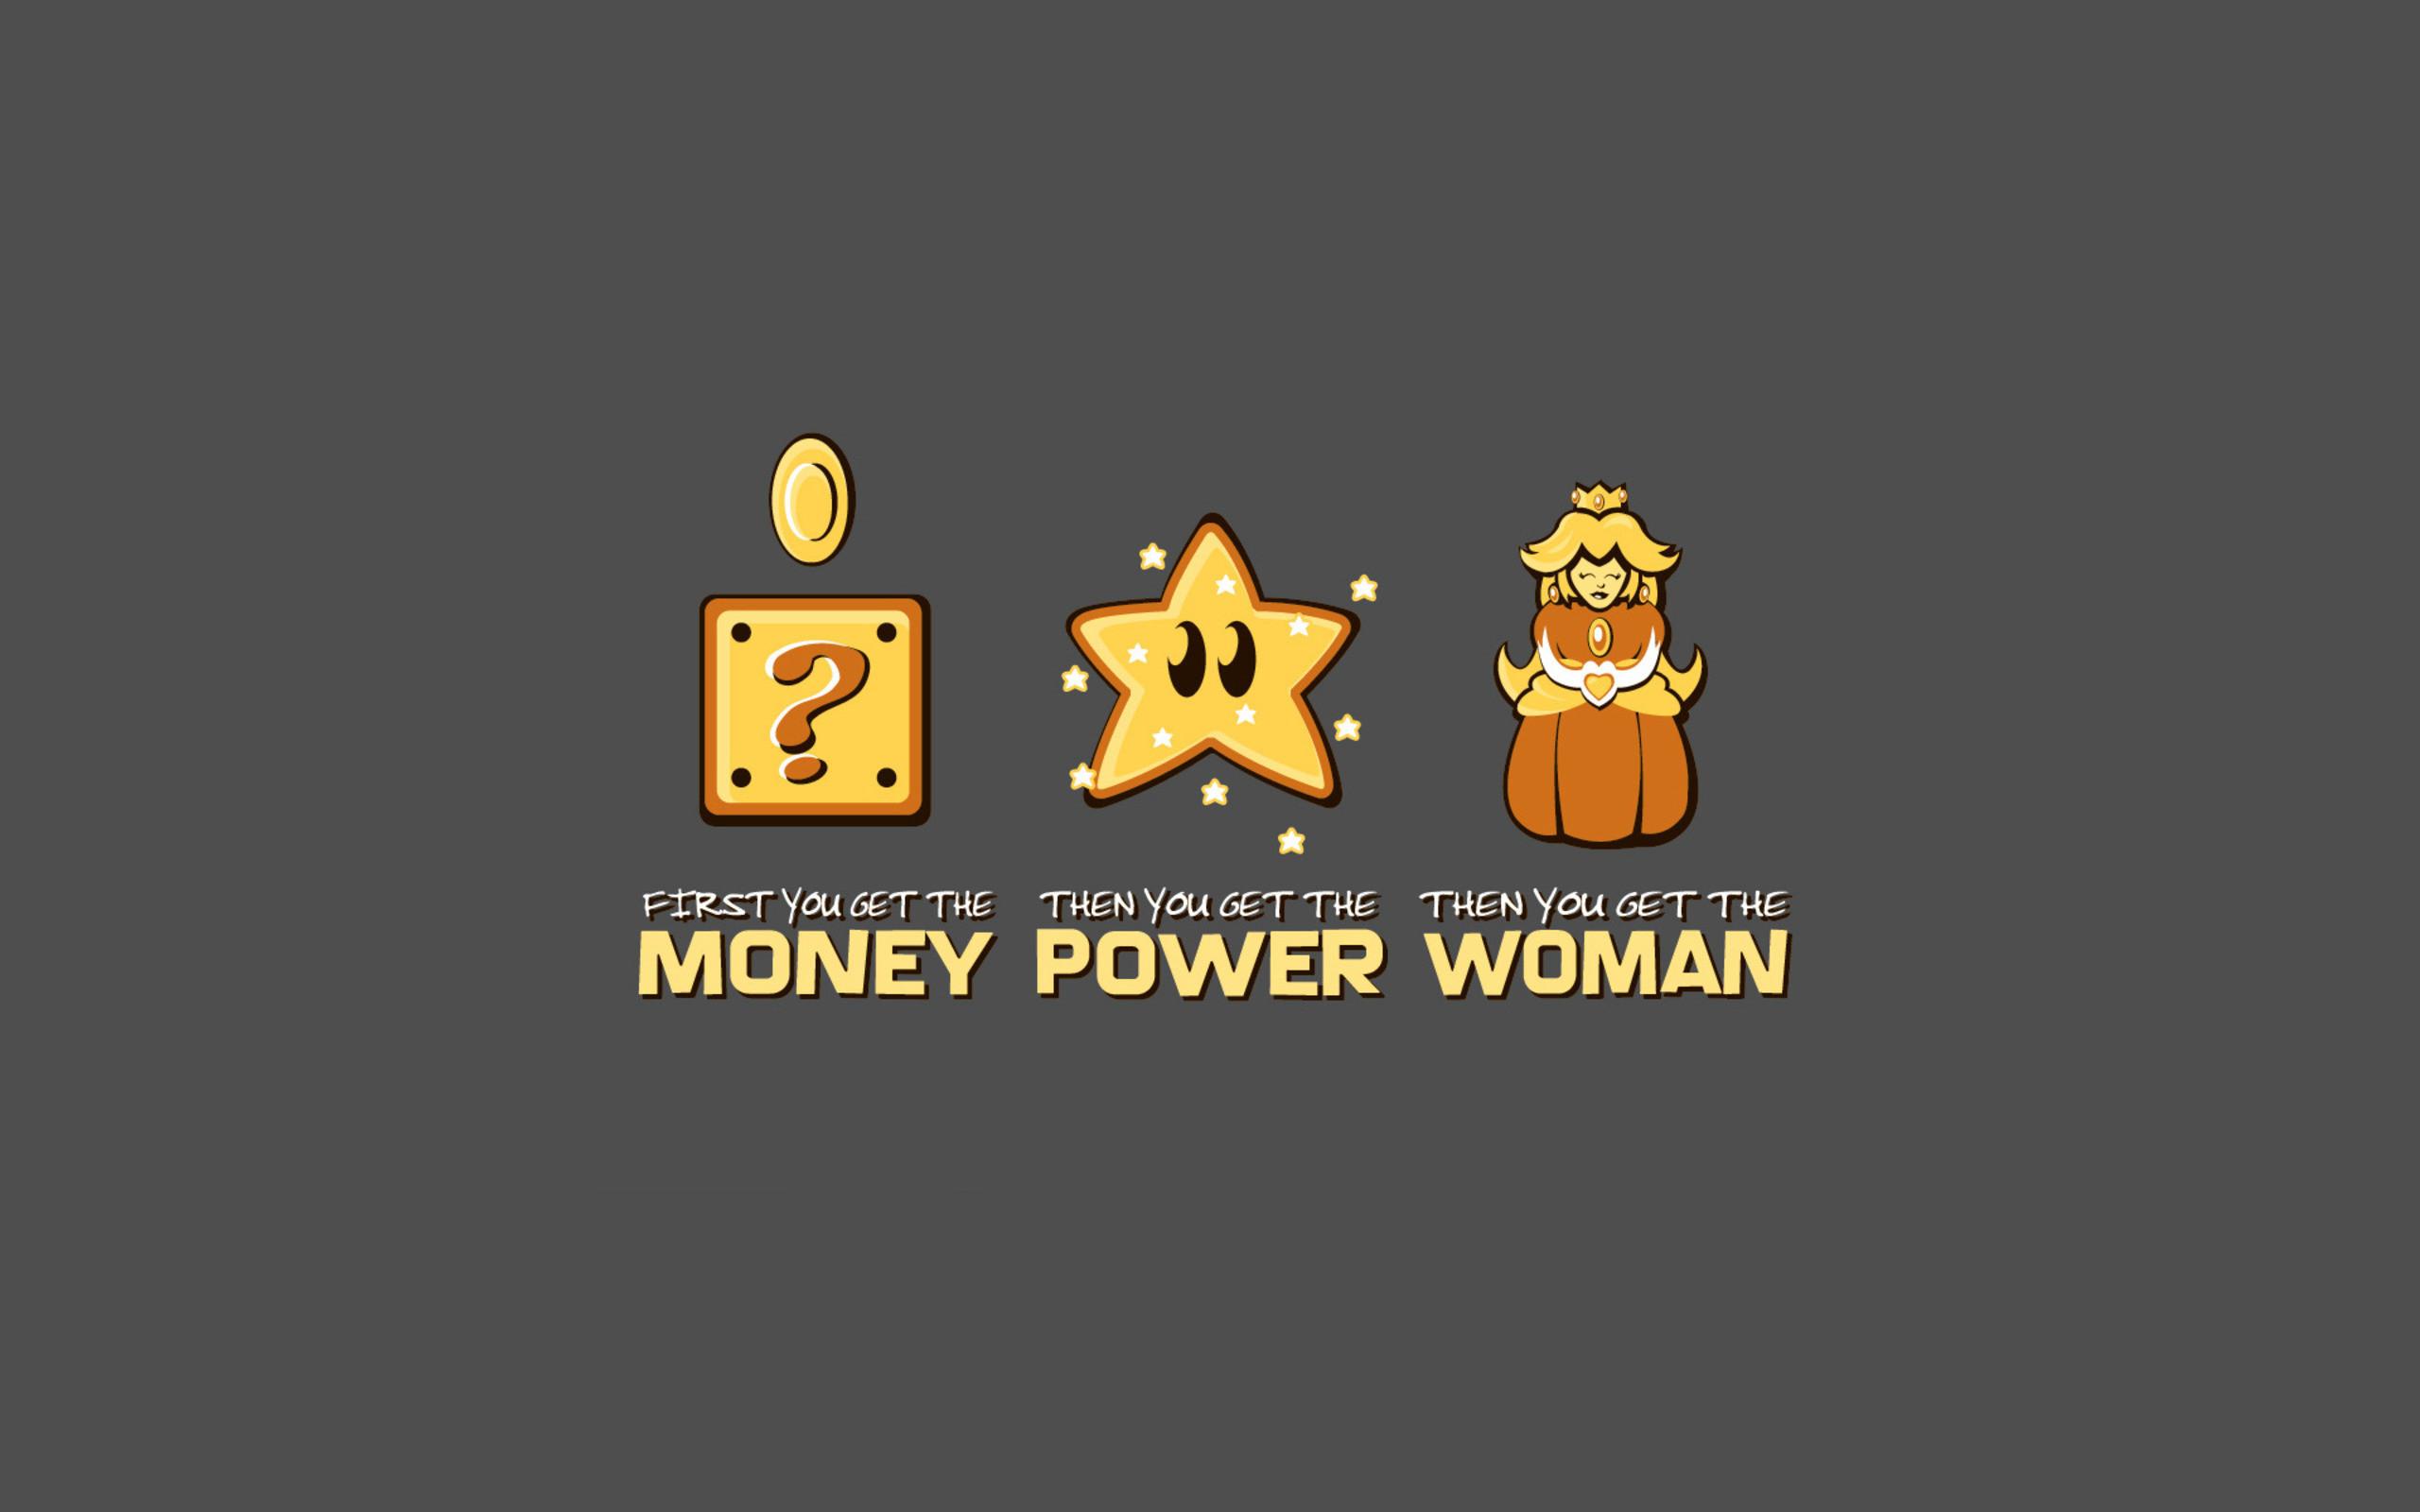 Mario Money Power Woman. Mario Money Power Woman via. Funny Work  Screensavers for Desktop